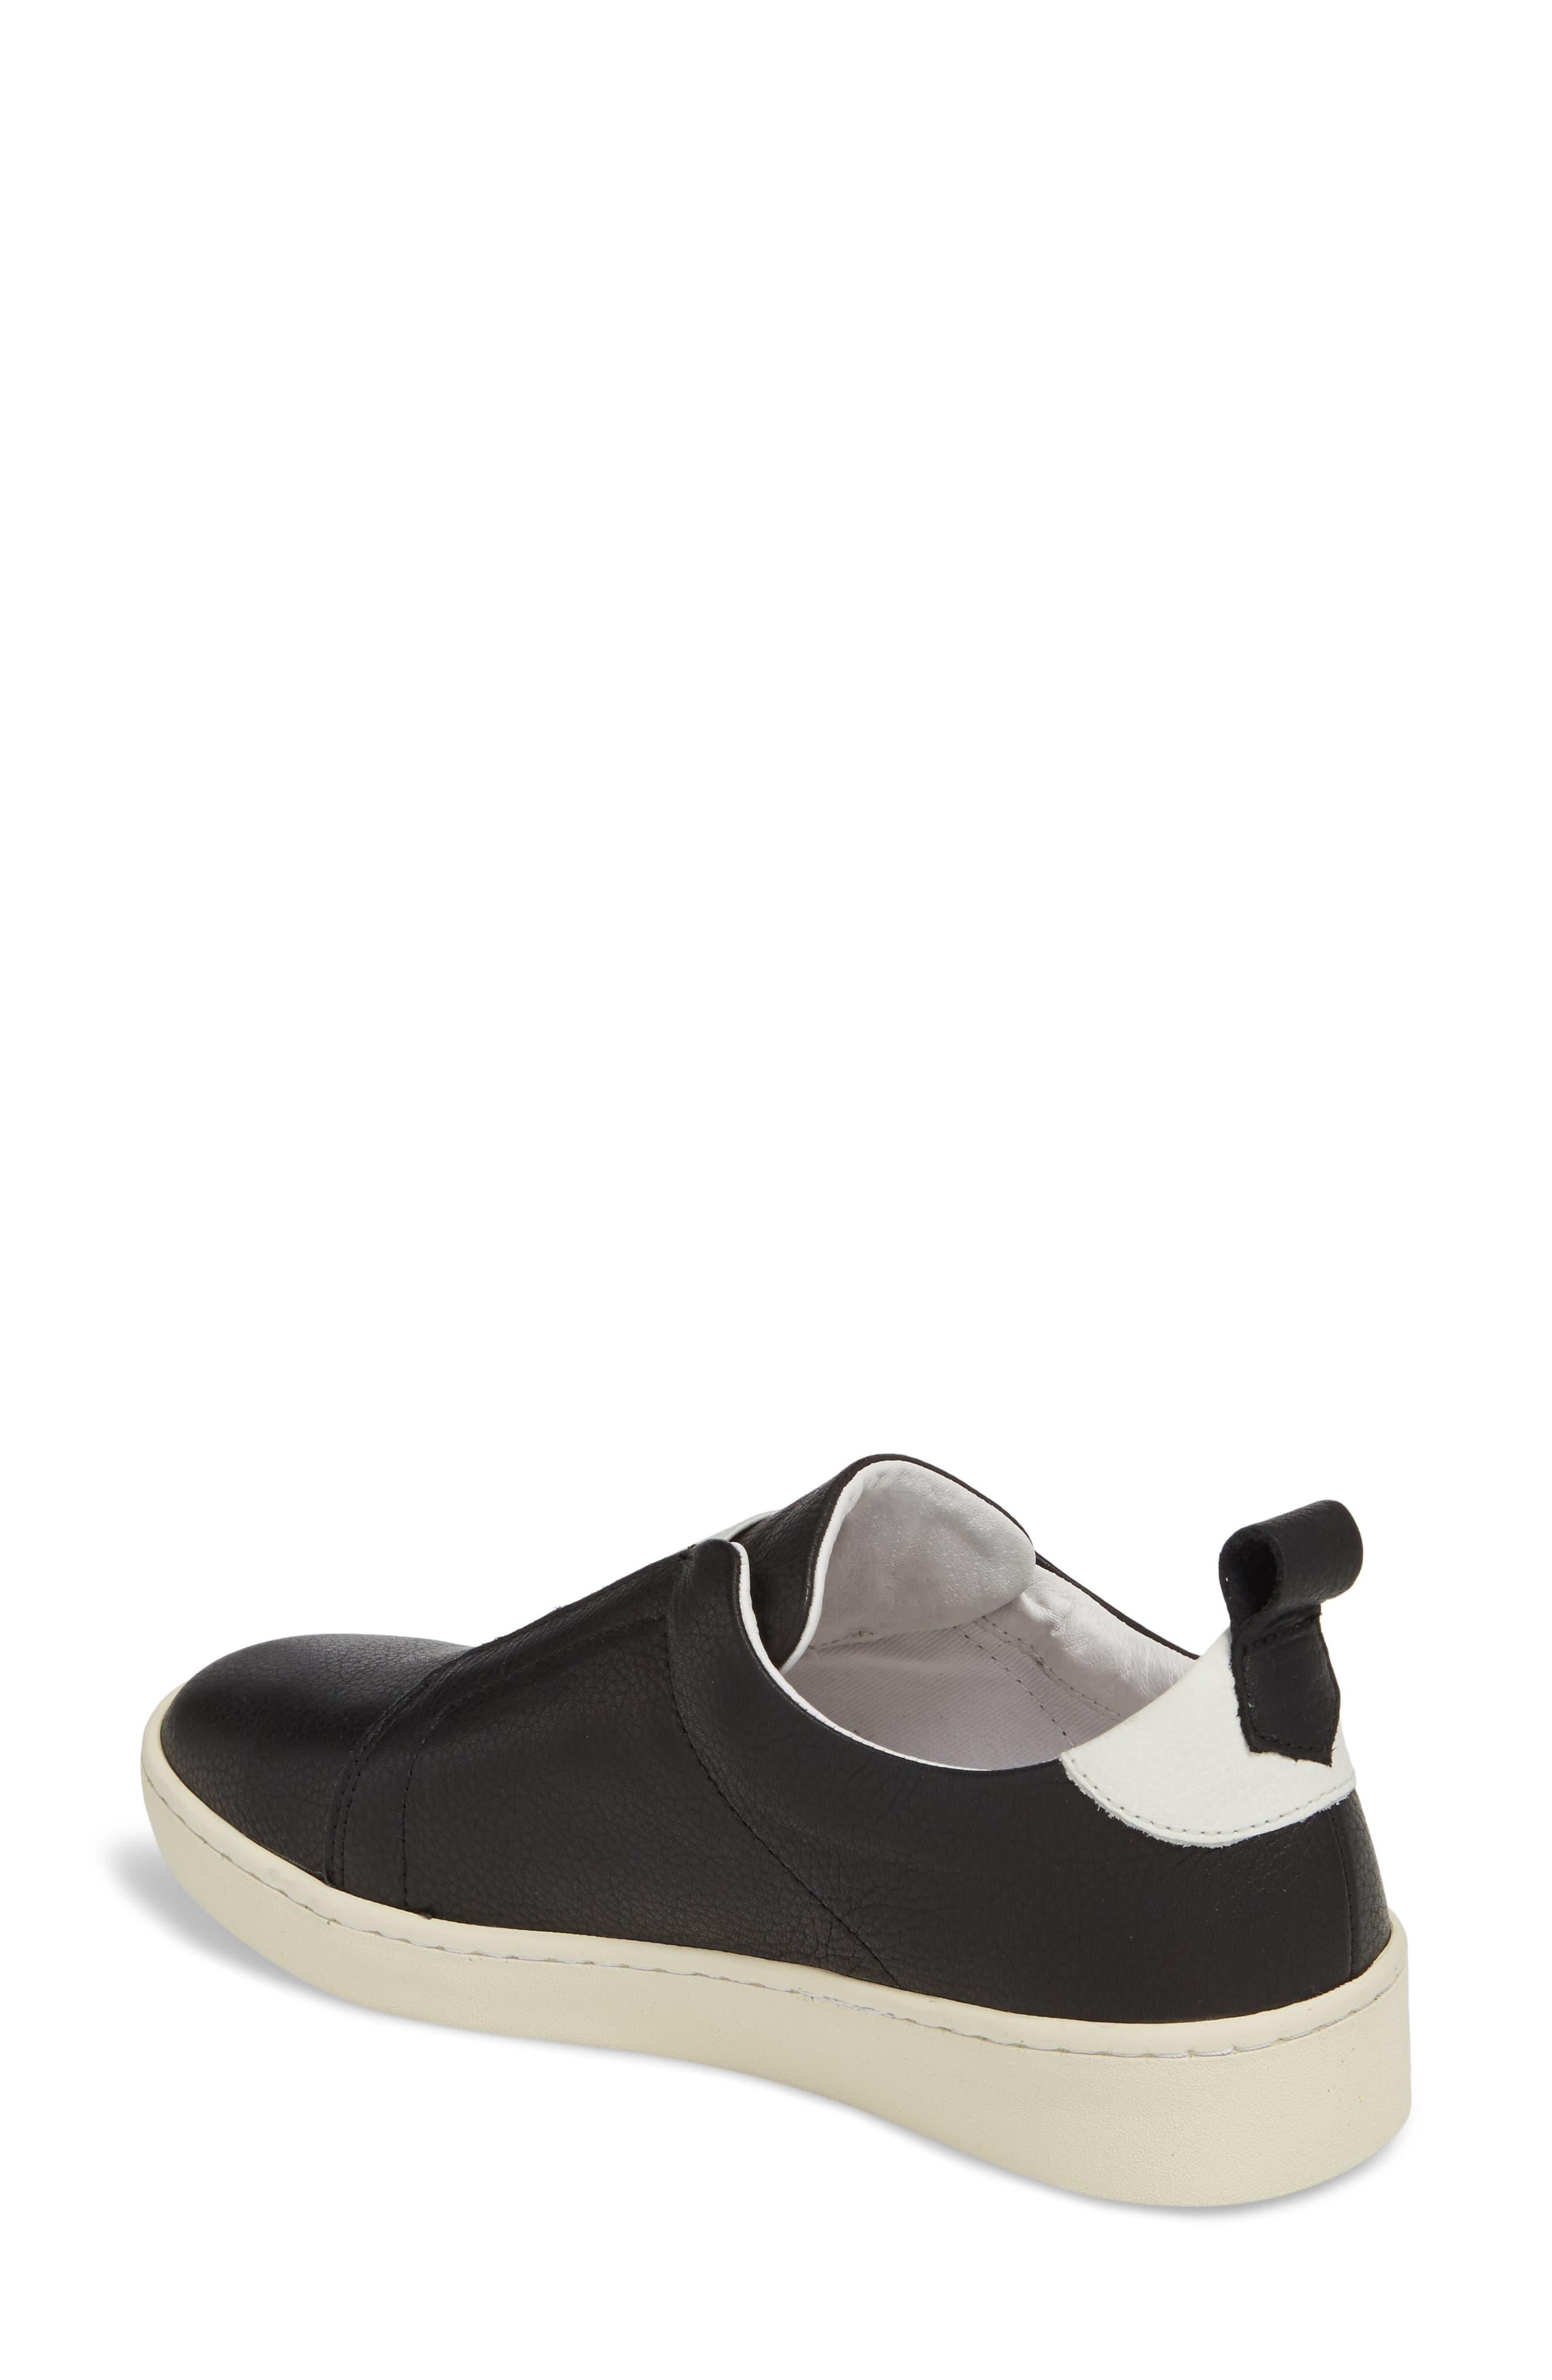 Mutt Slip-On Sneaker,                             Alternate thumbnail 2, color,                             BLACK BRITO LEATHER